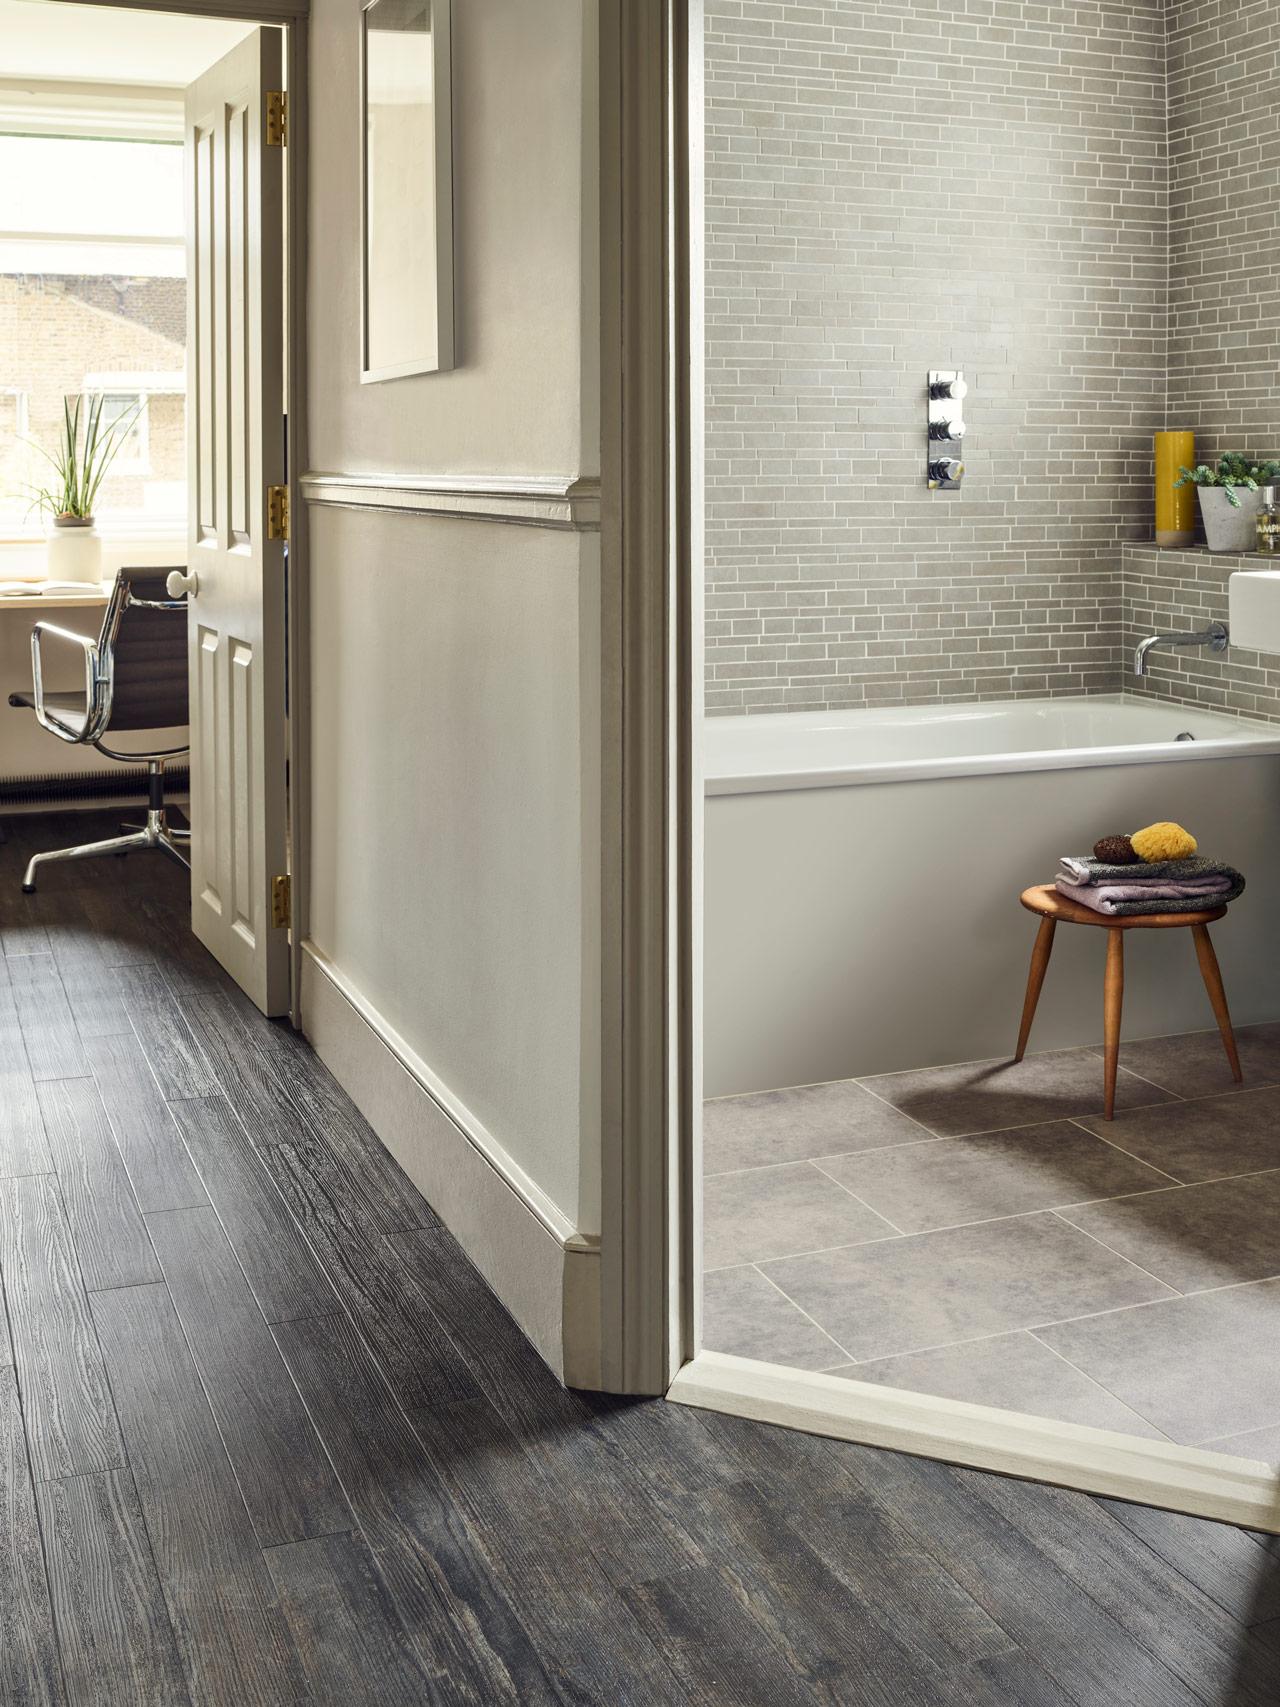 hallway  amtico spacia blackened spa wood  ss5s3069  in a stripwood laying pattern  luxury vinyl flooring  u0026 tiles   design flooring by amtico  rh   amtico com